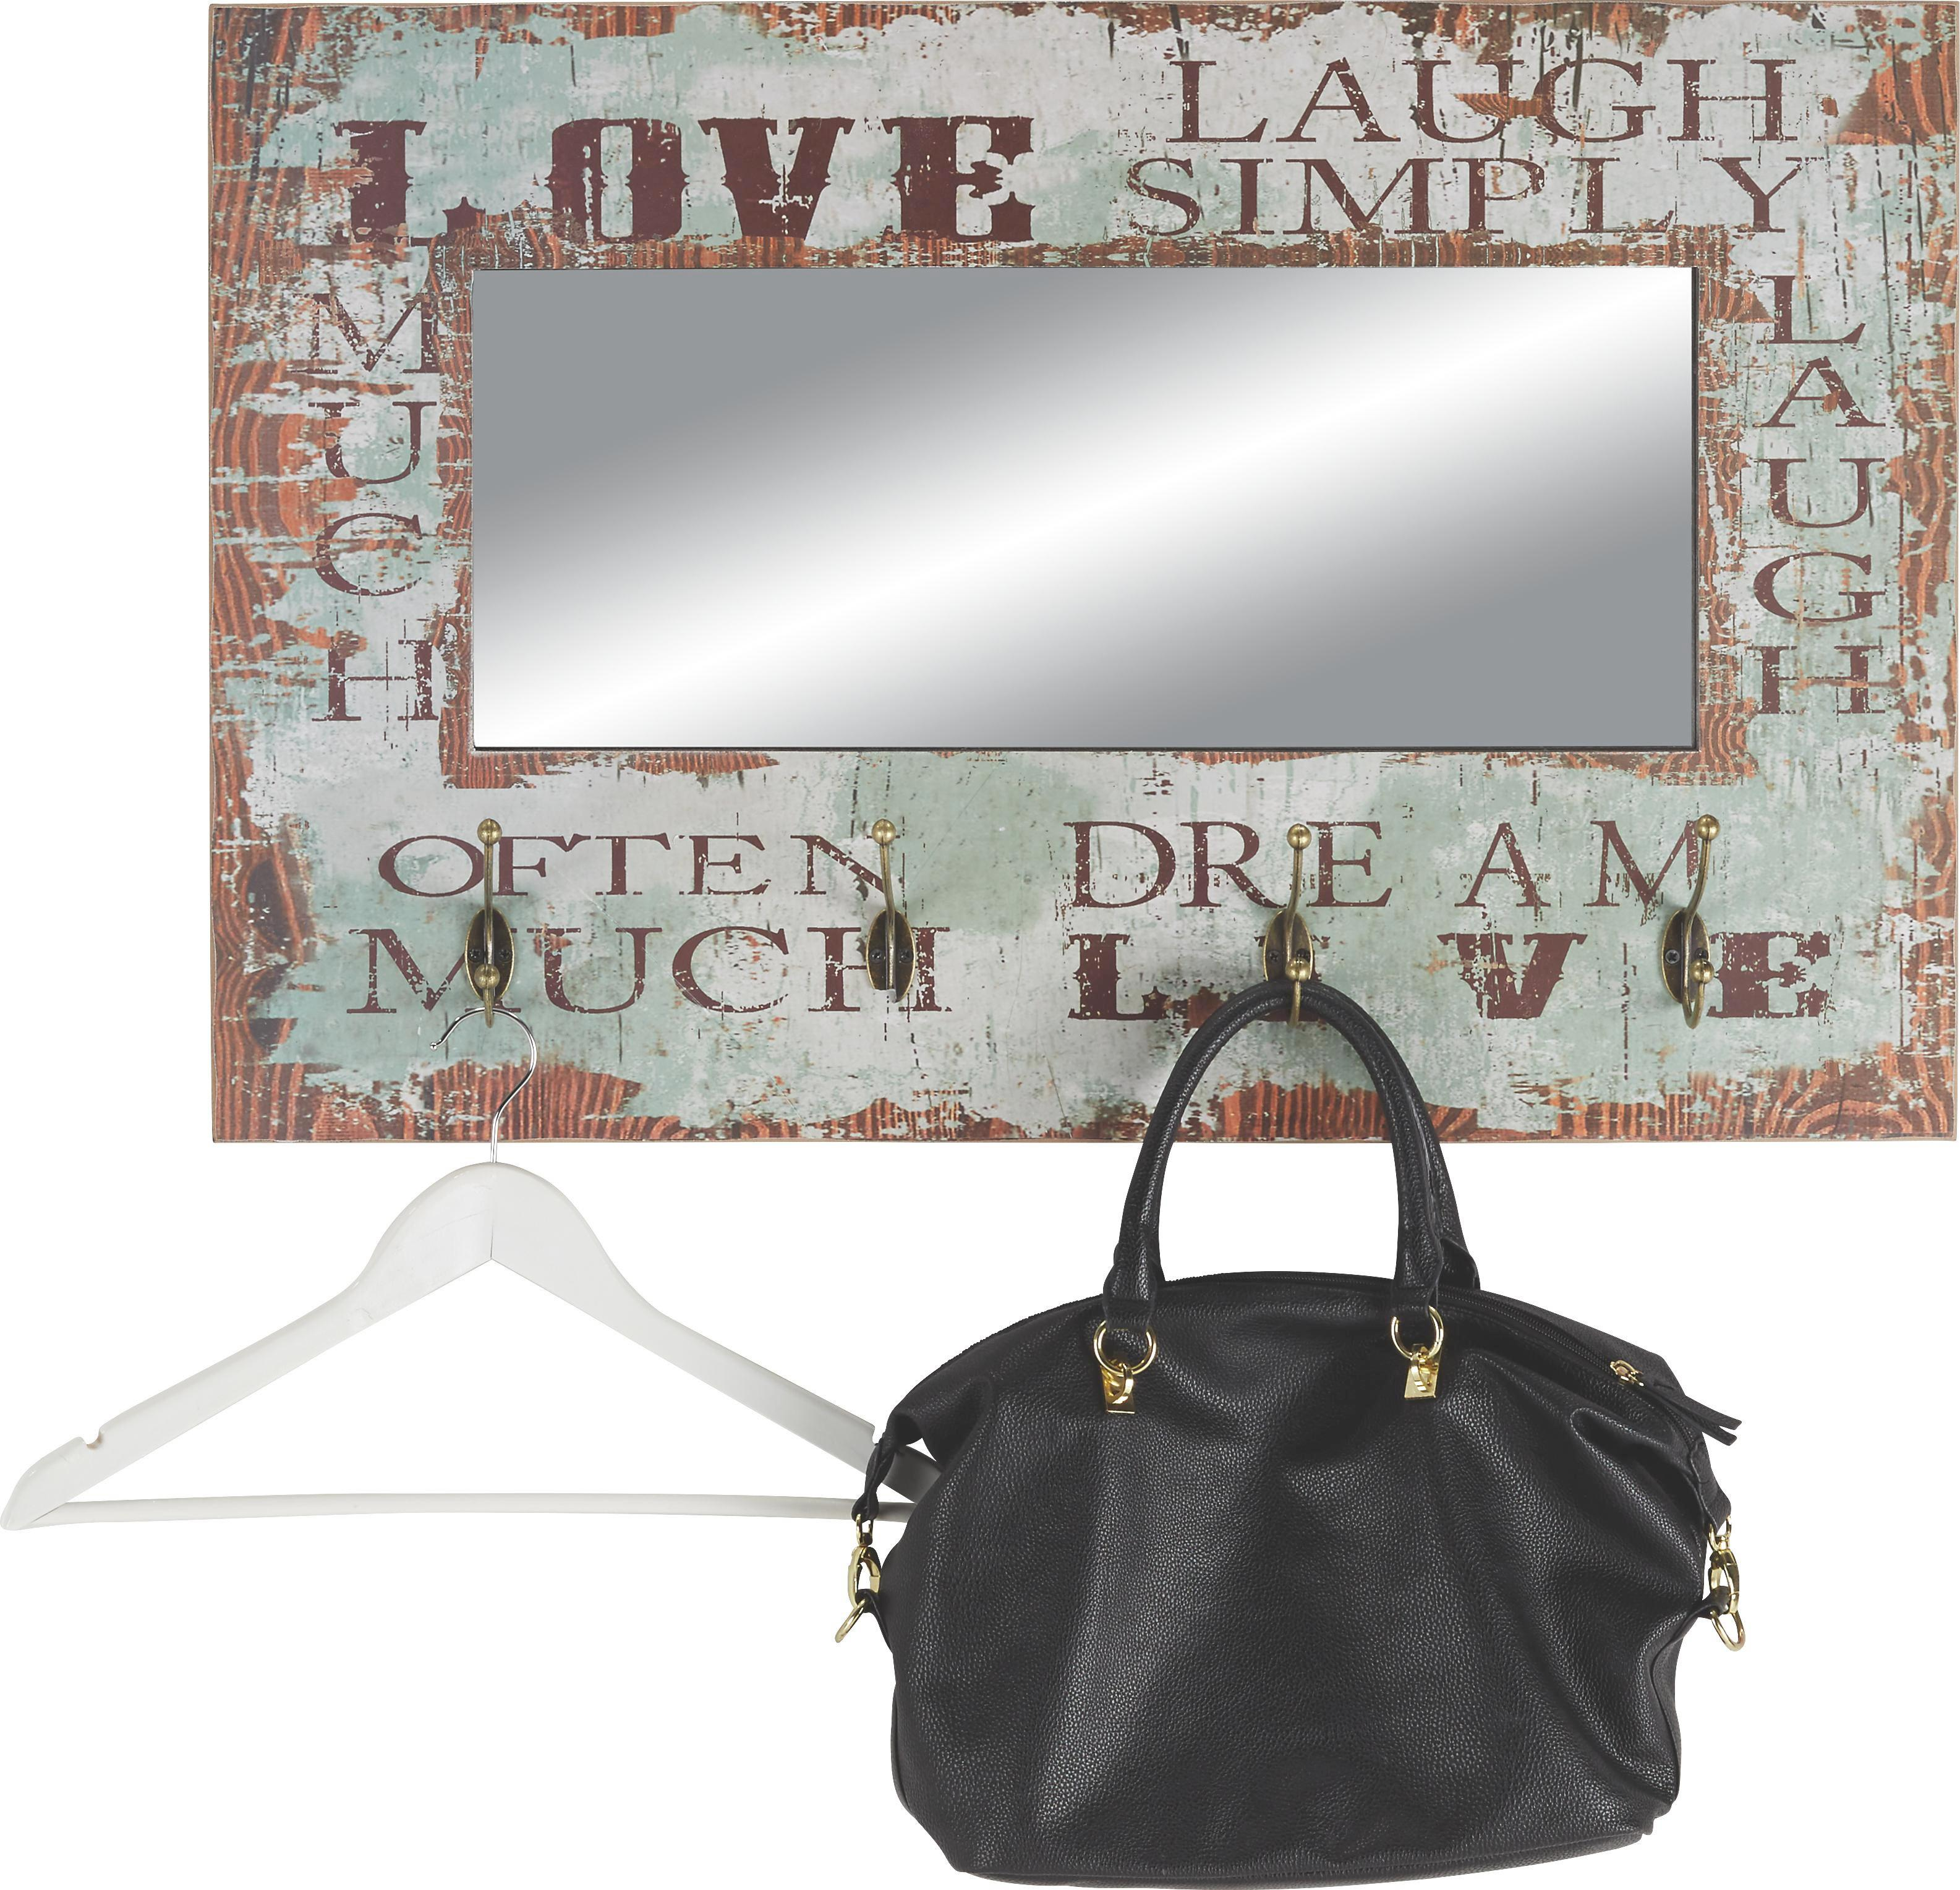 Wandspiegel ca. 80x52x10cm - Multicolor, LIFESTYLE, Holz/Metall (80/52/10cm) - MÖMAX modern living